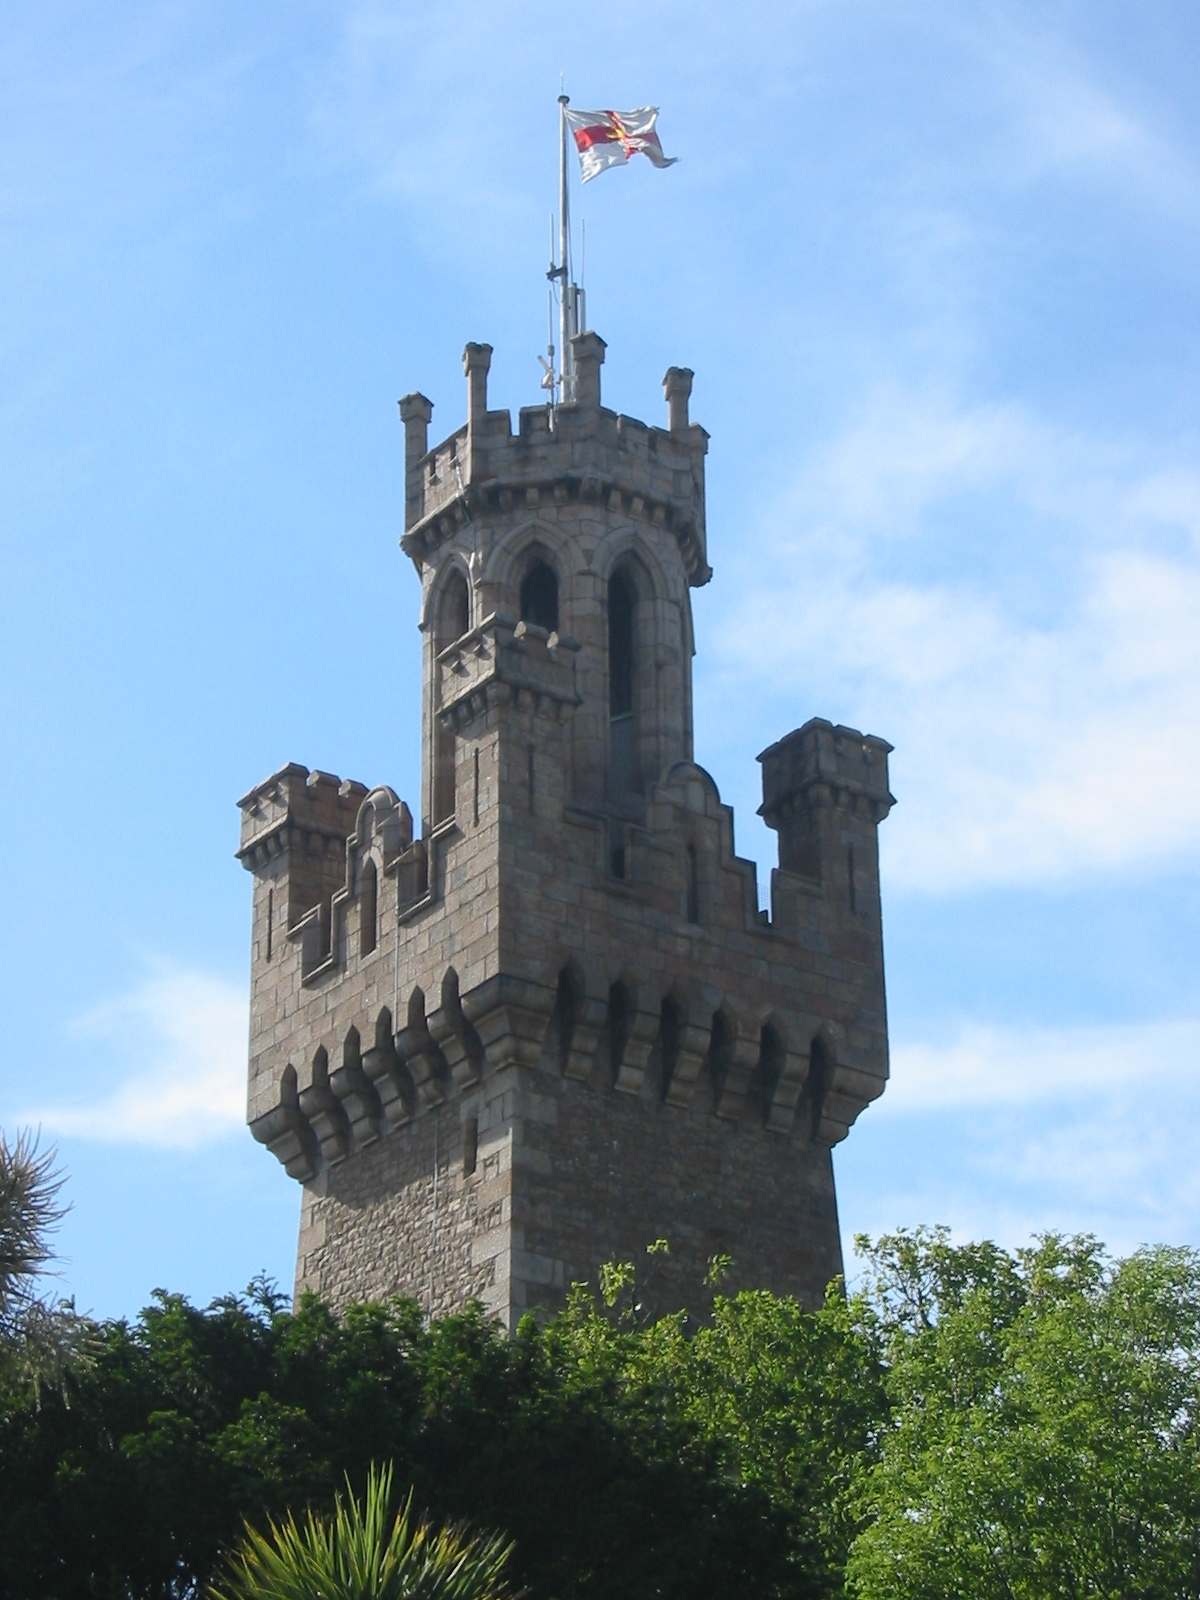 Guernsey - Victoria Tower in Saint Peter Port